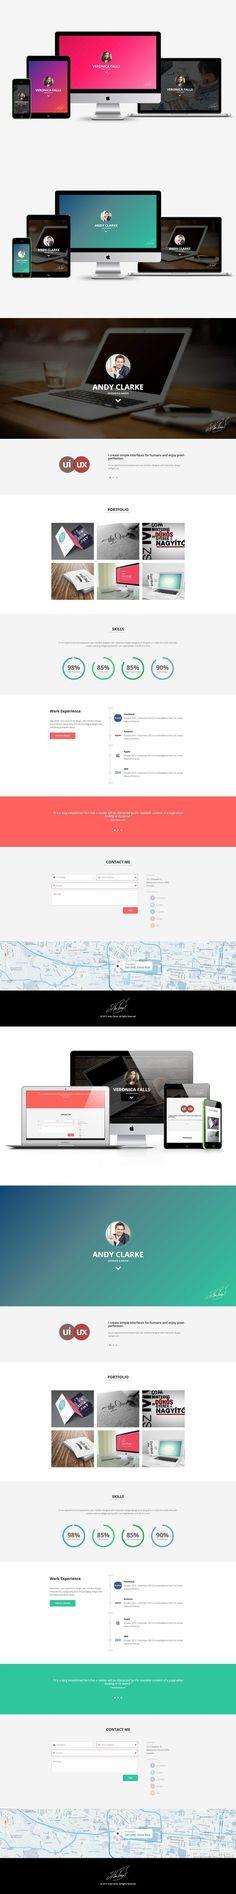 Ezna u2013 Personal Portfolio Template HTML CSS Themes HTML CSS - resume templates html